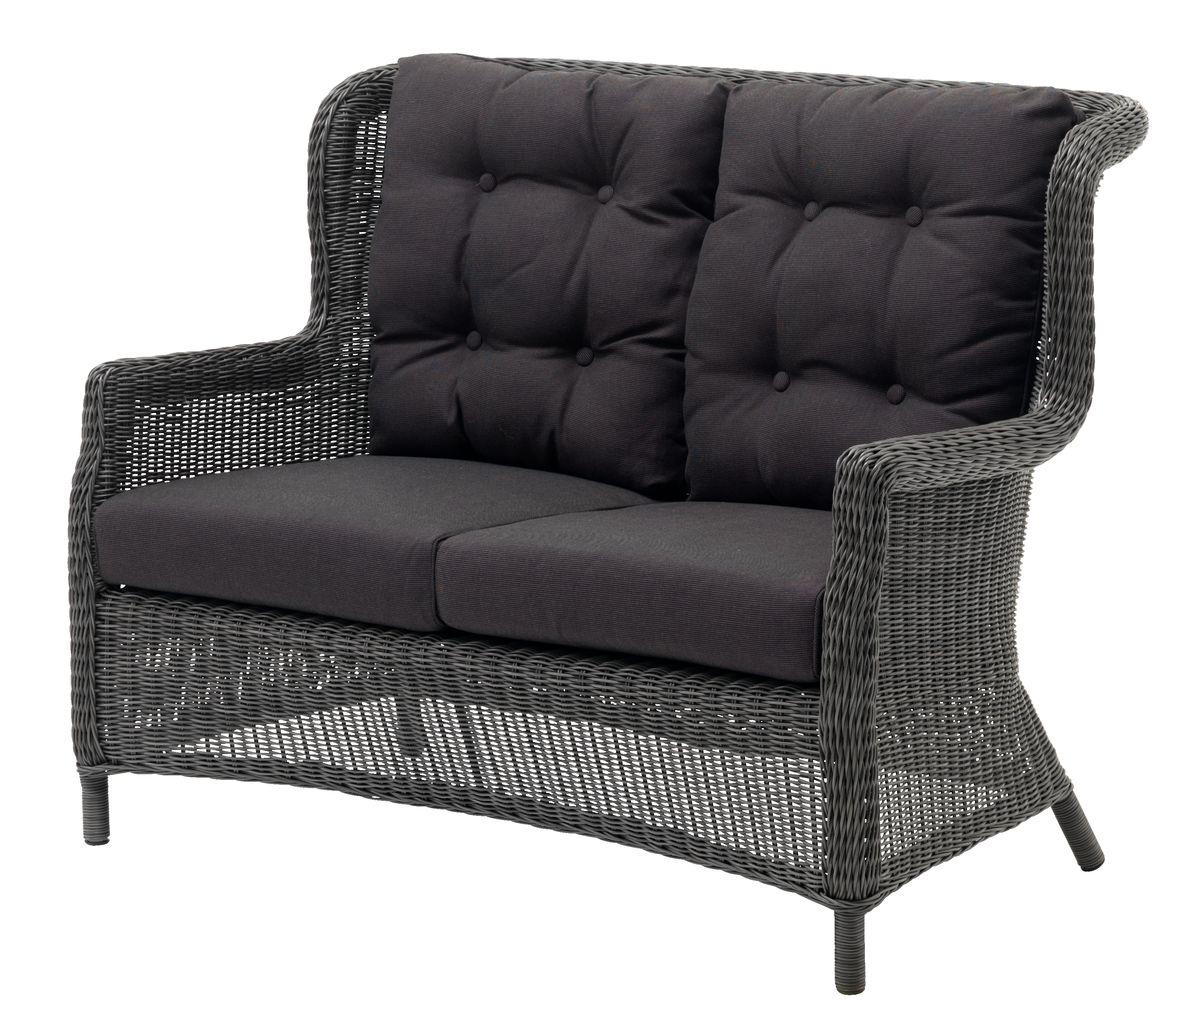 Sofa FALKENBERG 2 pers. grå | JYSK